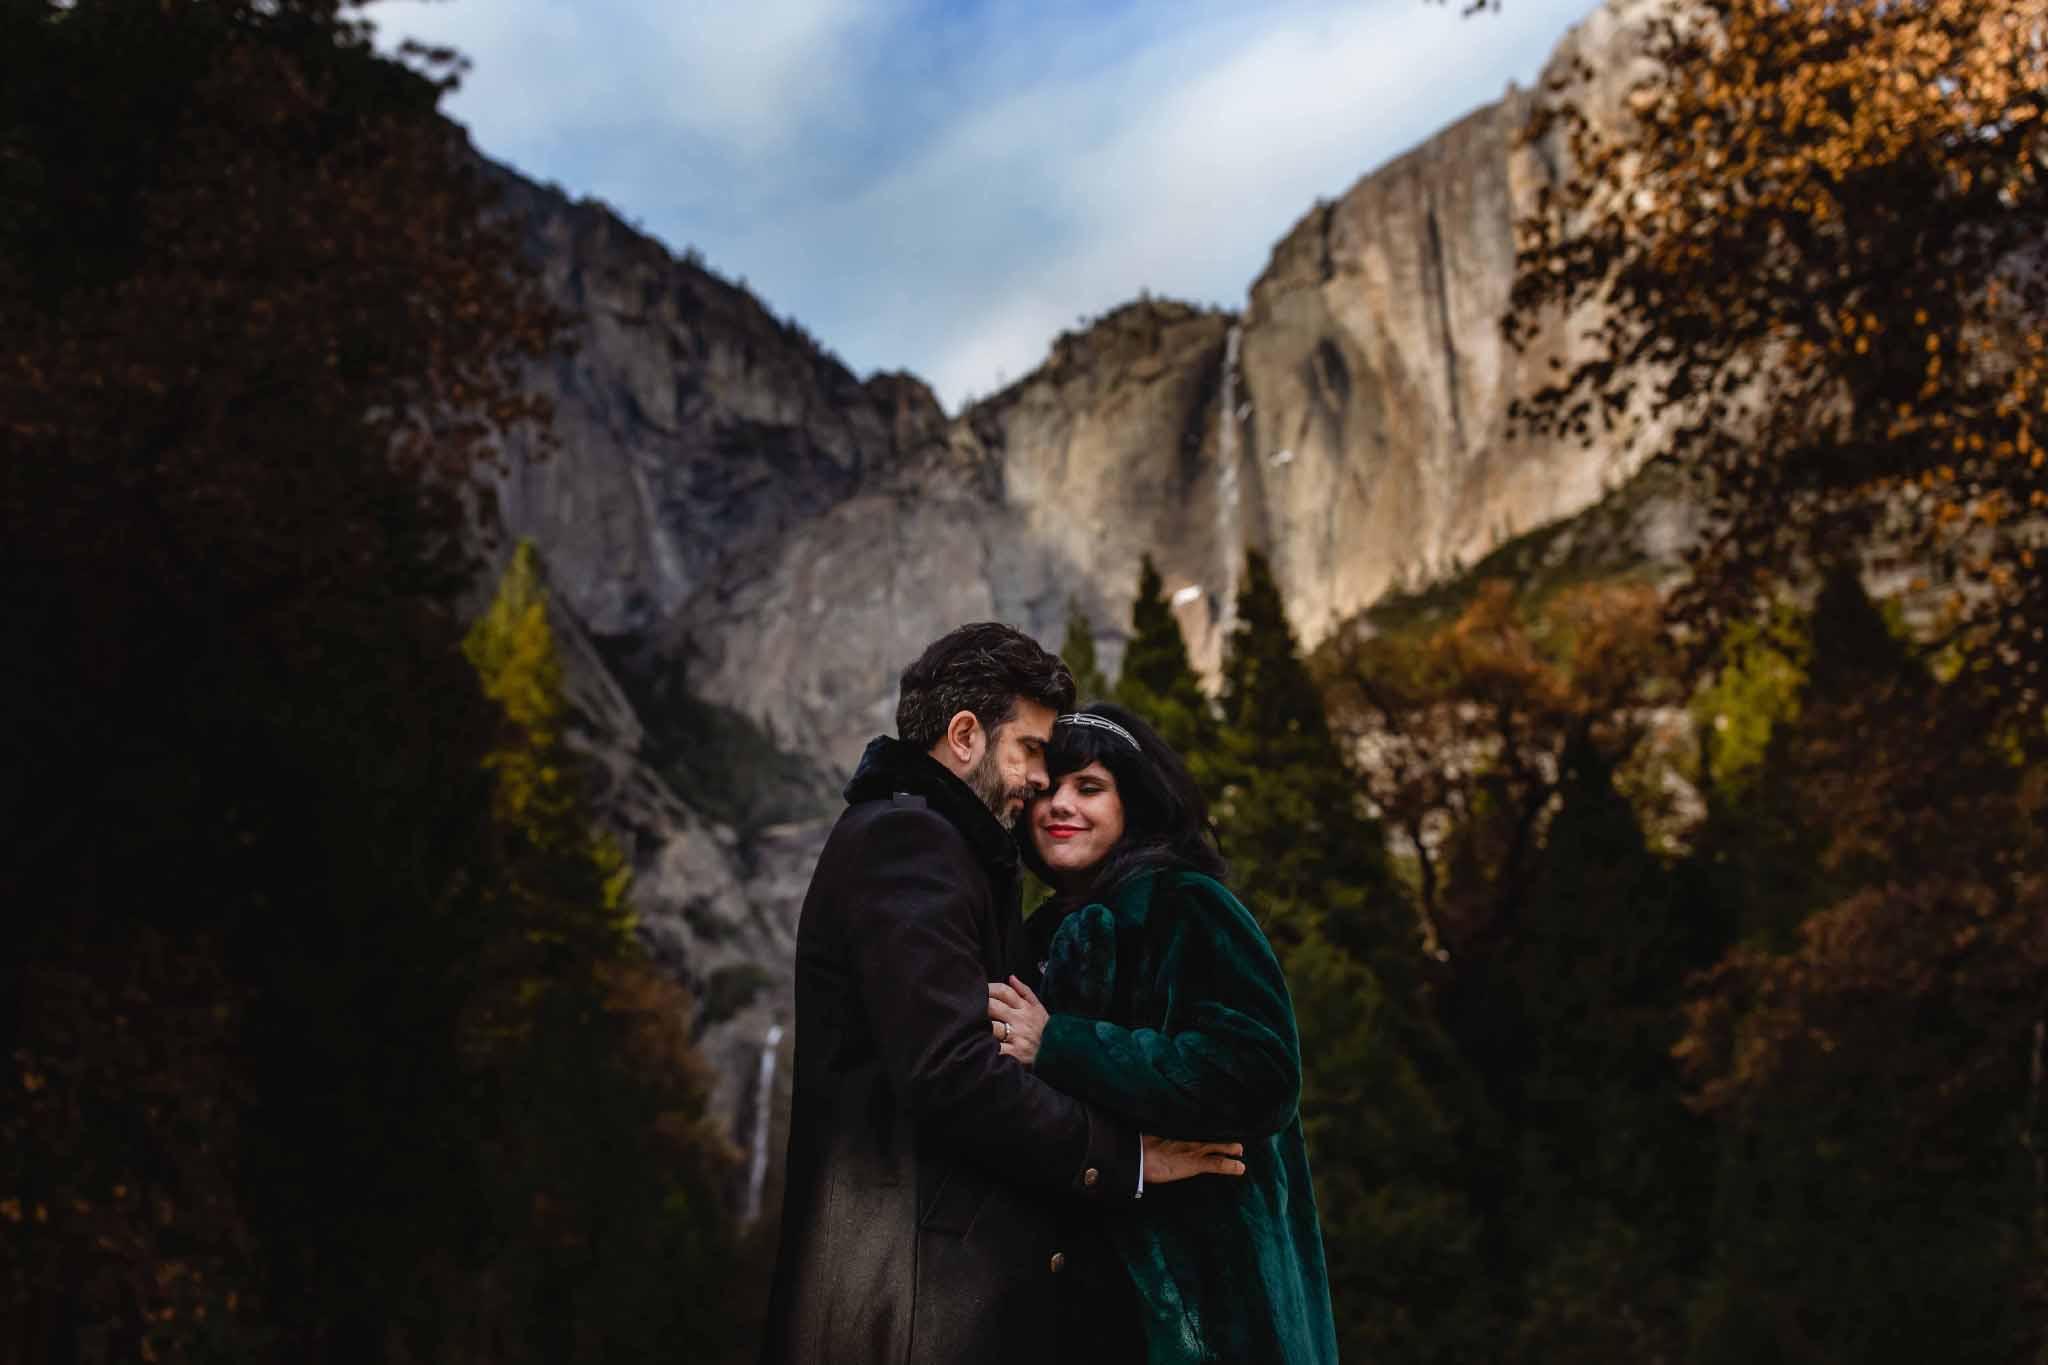 Destination Photographer, Yosemite National Park,Wedding, Pictures, Photos, Rocker in love, Ana Corsmeier